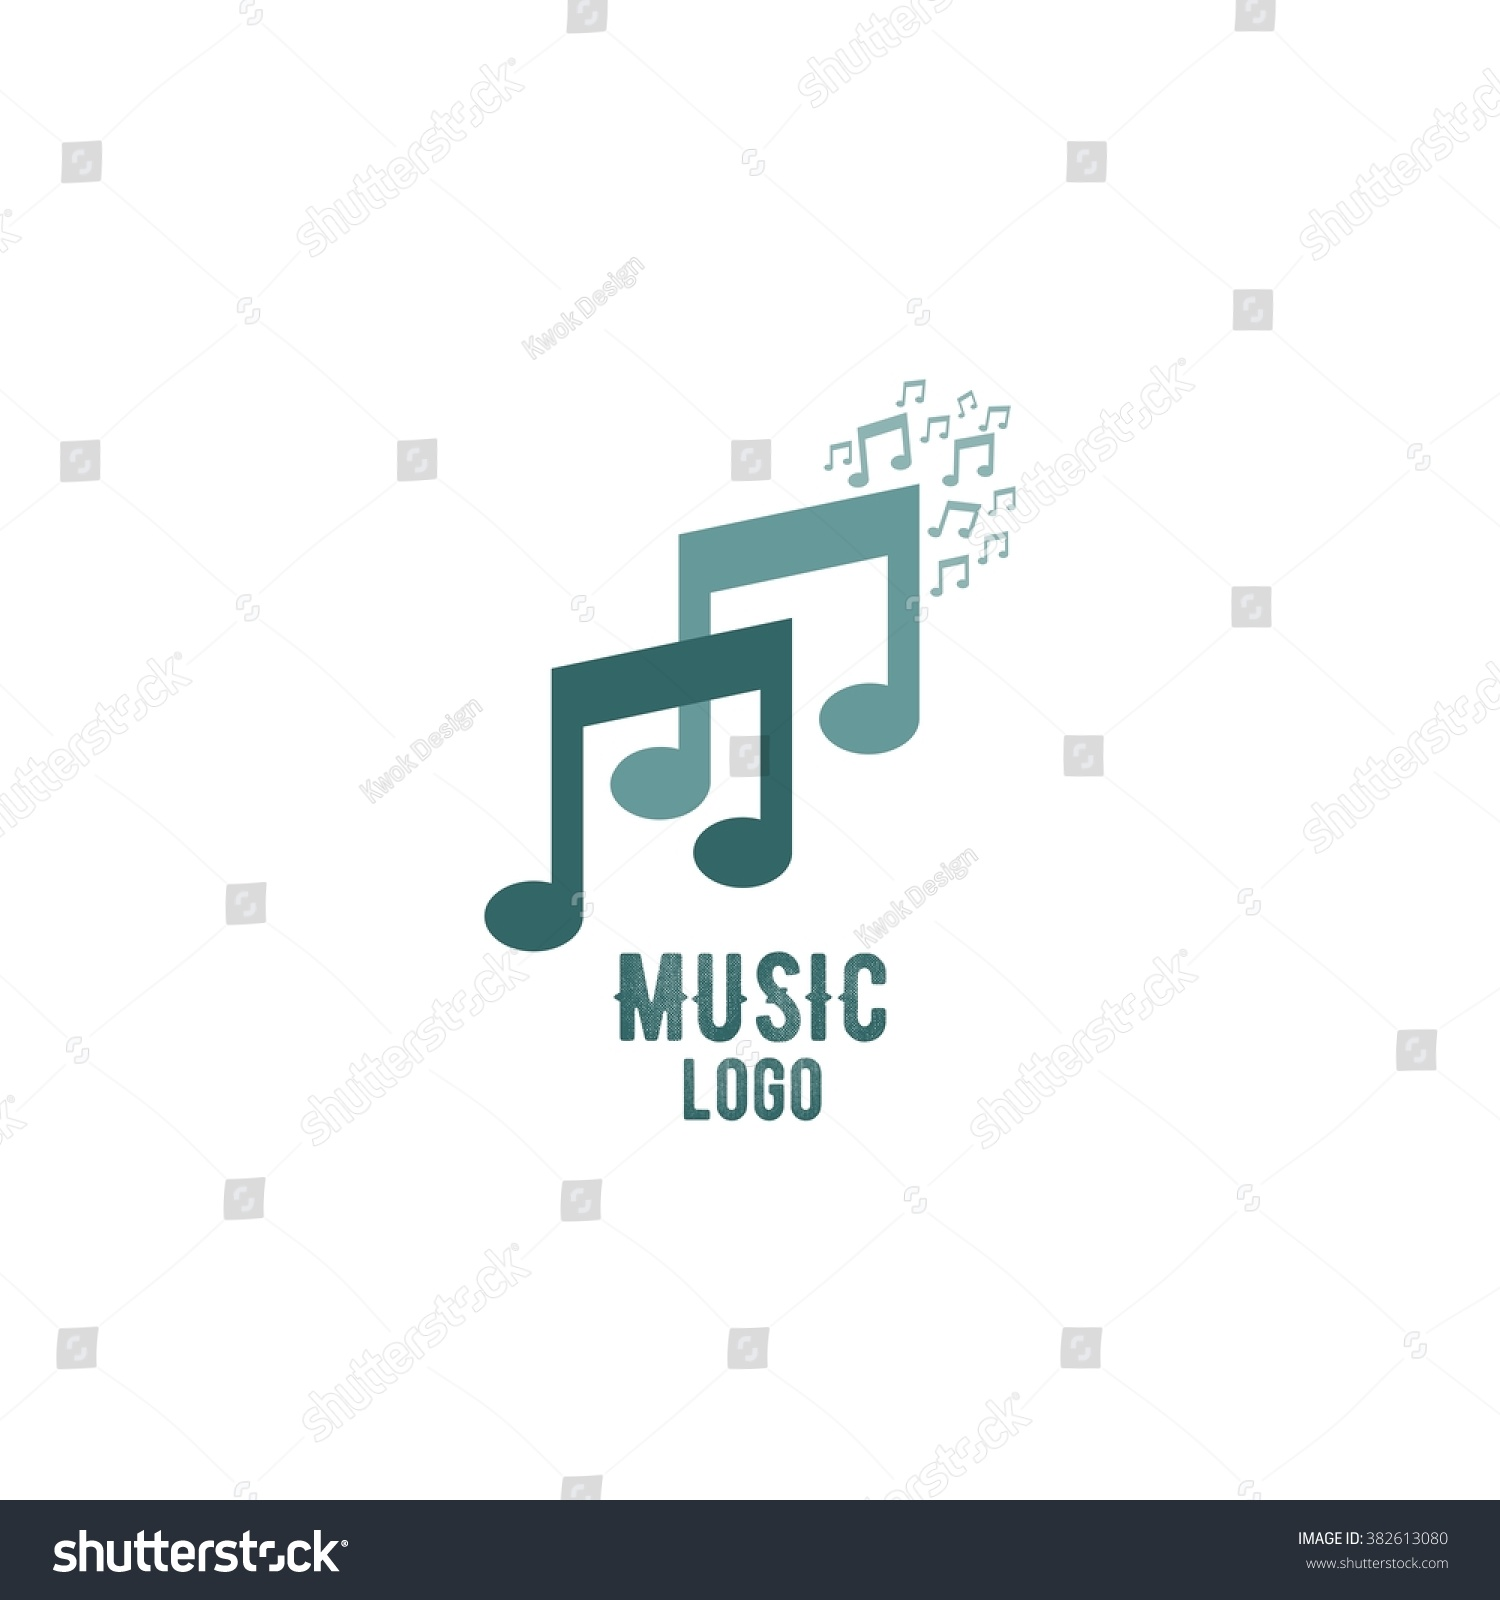 Best Business Logo Design App: Music Logo Design Template Vector Illustration Stock Vector (Royalty rh:shutterstock.com,Design